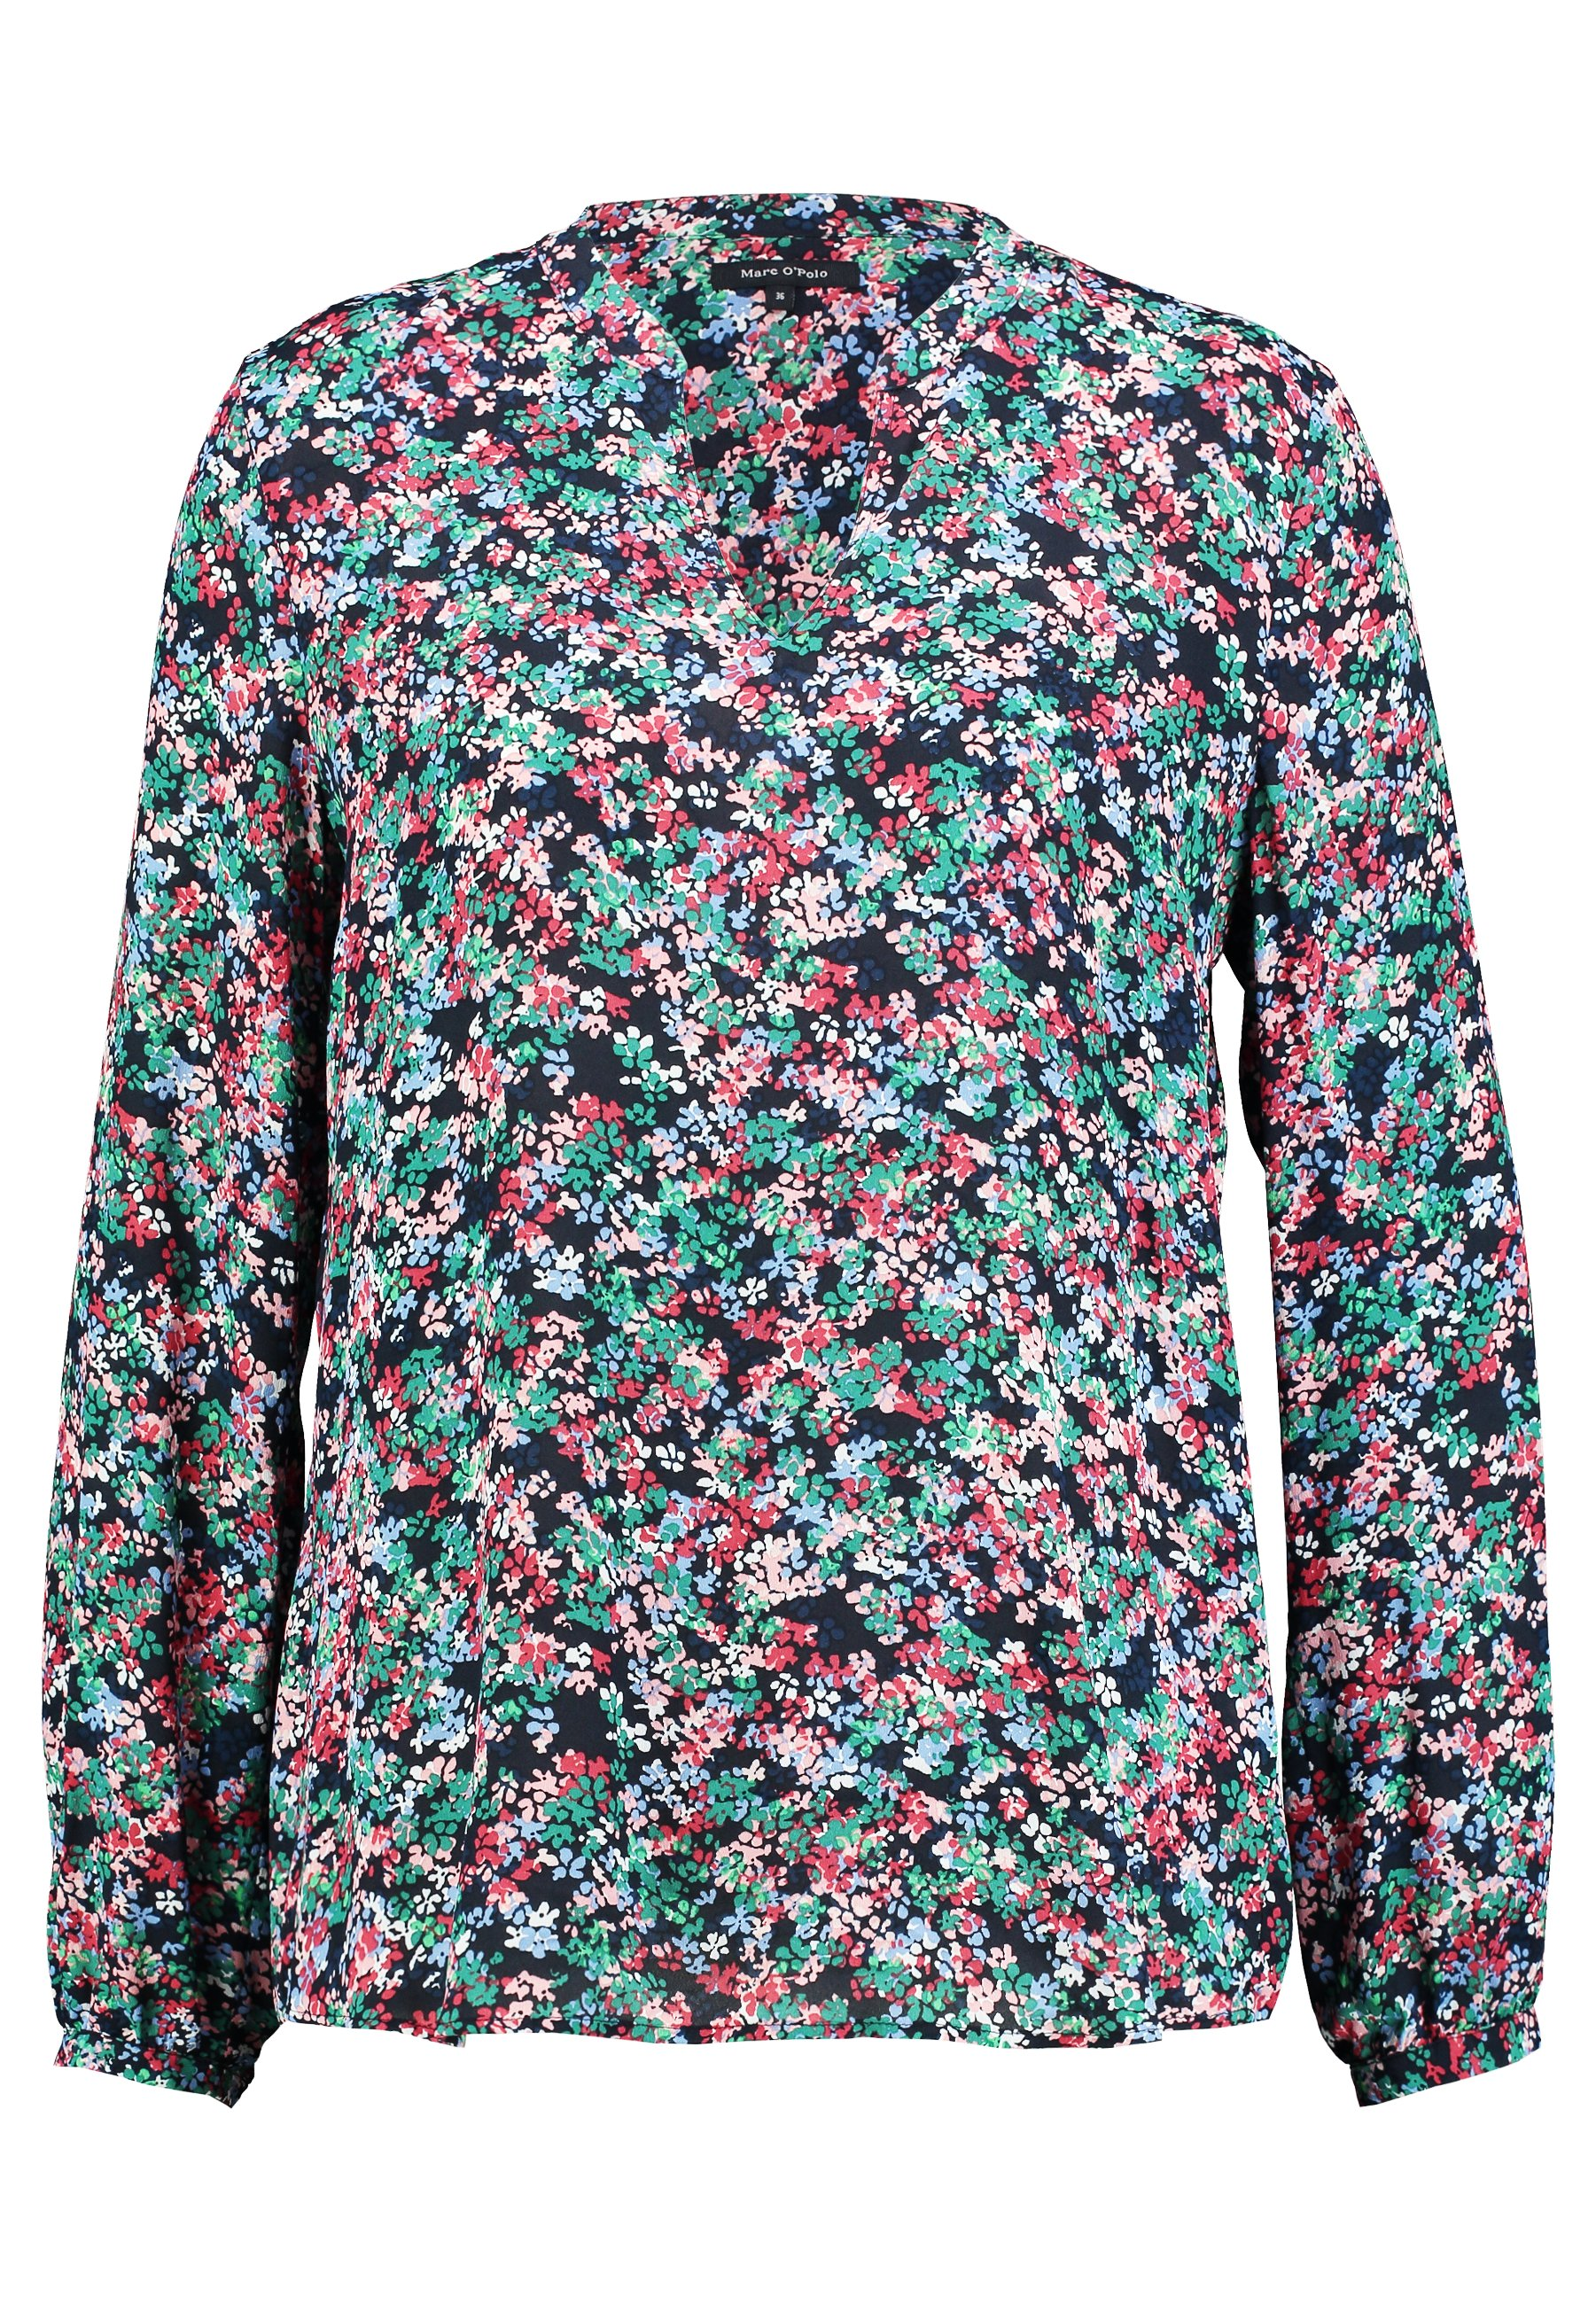 Marc O'polo Blouse Open V Neck Long Sleeved - Blus Multi-coloured